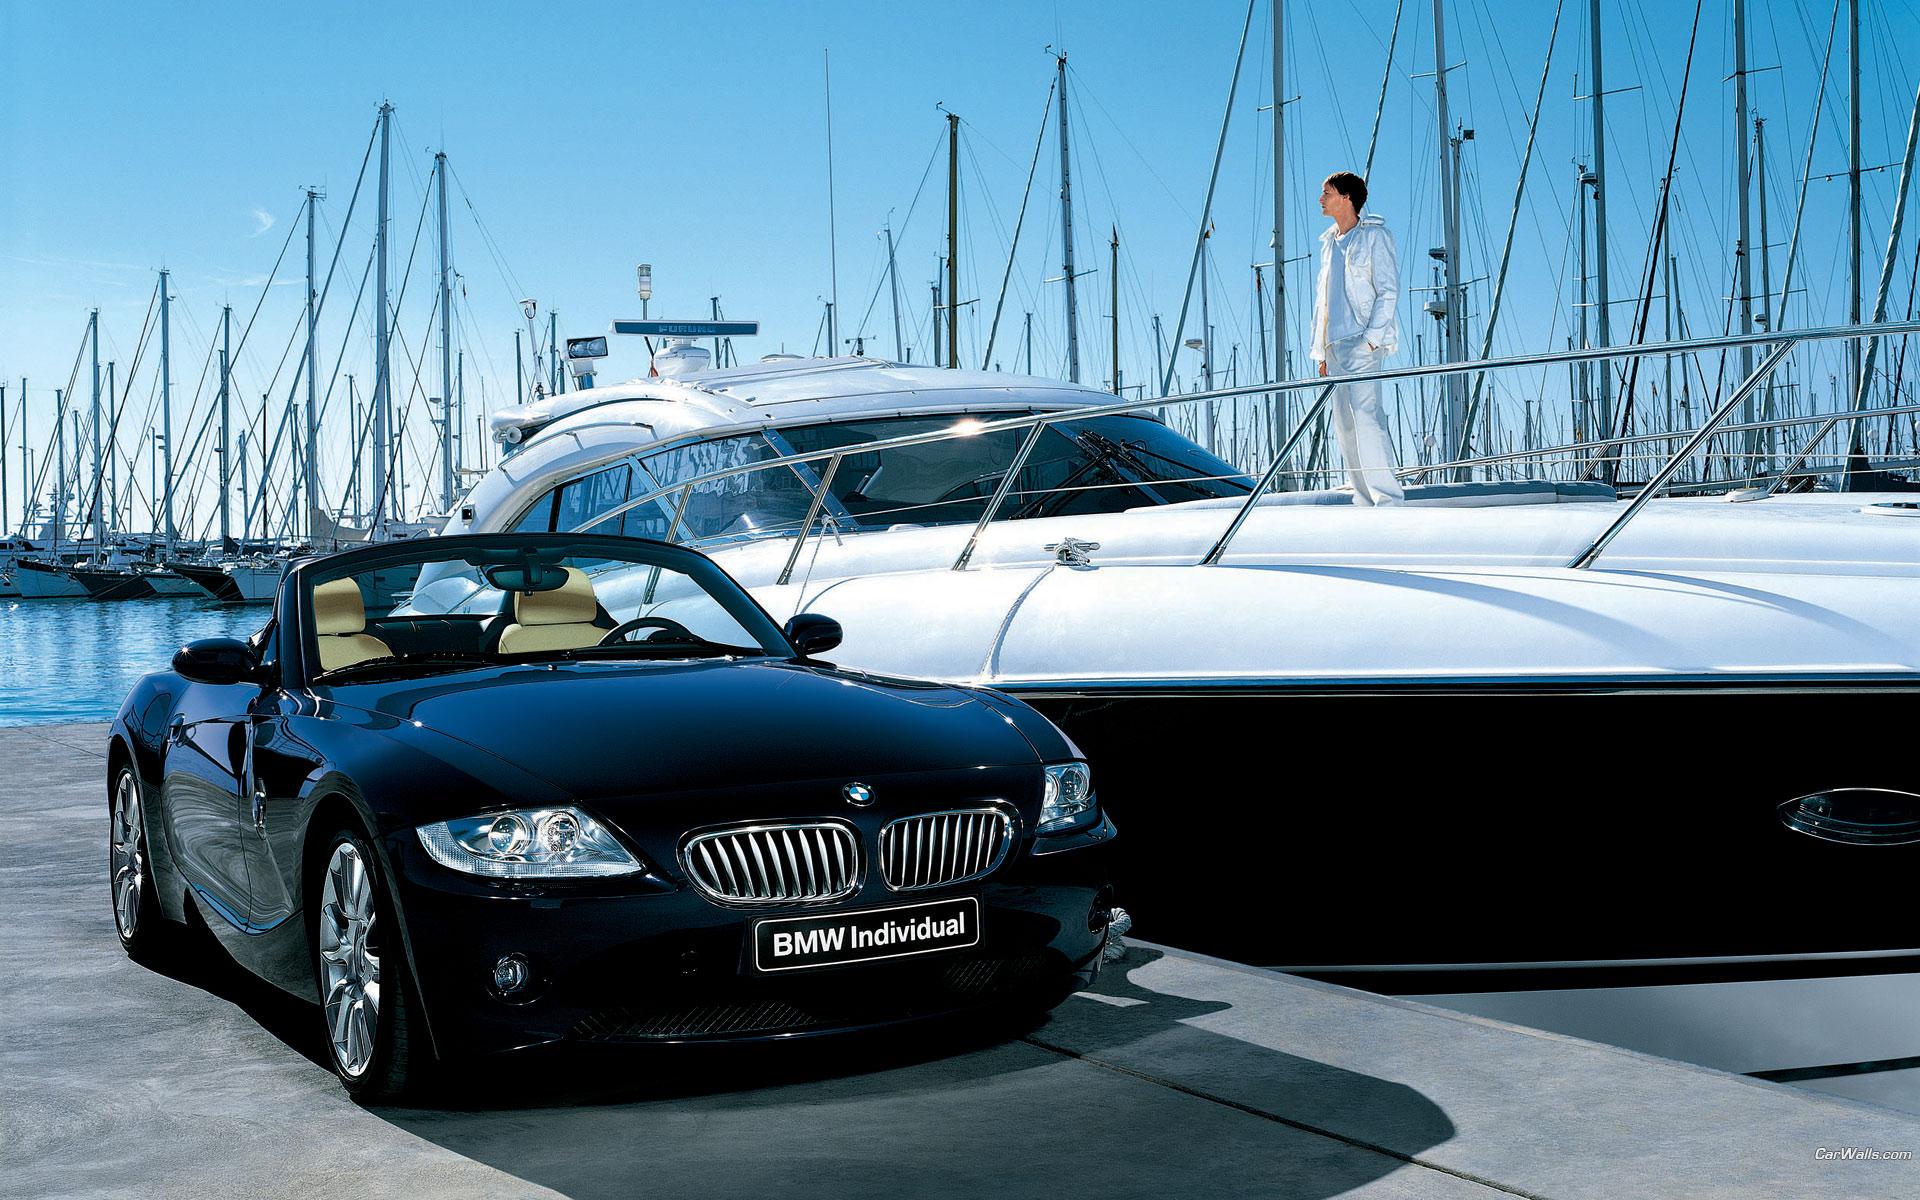 Free Download Hq Z4 Cabriolet Black Yacht Bmw Wallpaper